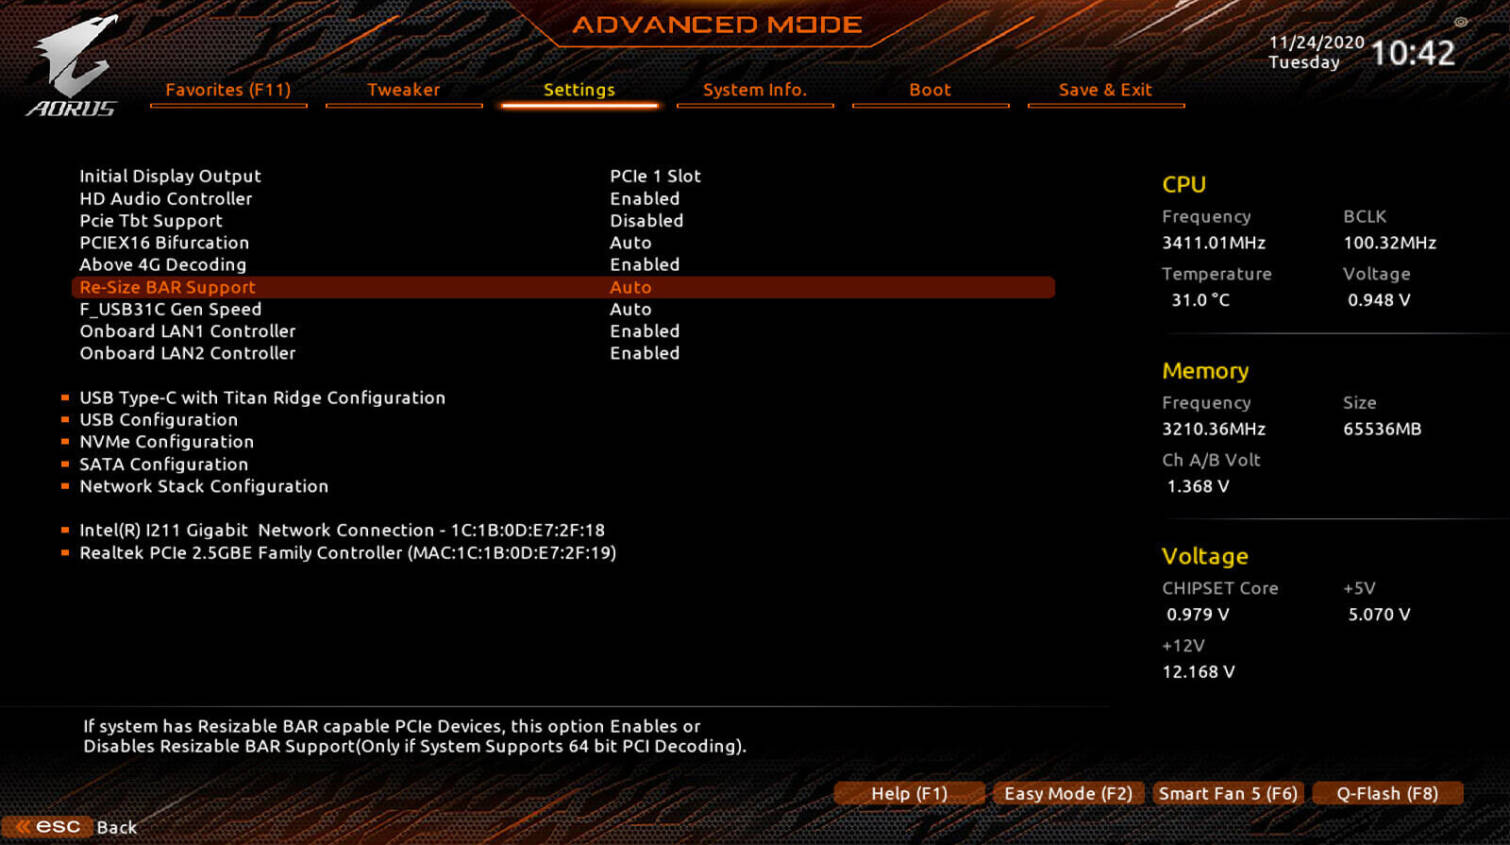 (PR) GIGABYTE Releases Resizable BAR Support for AMD 500-series Motherboards via BIOS Updates